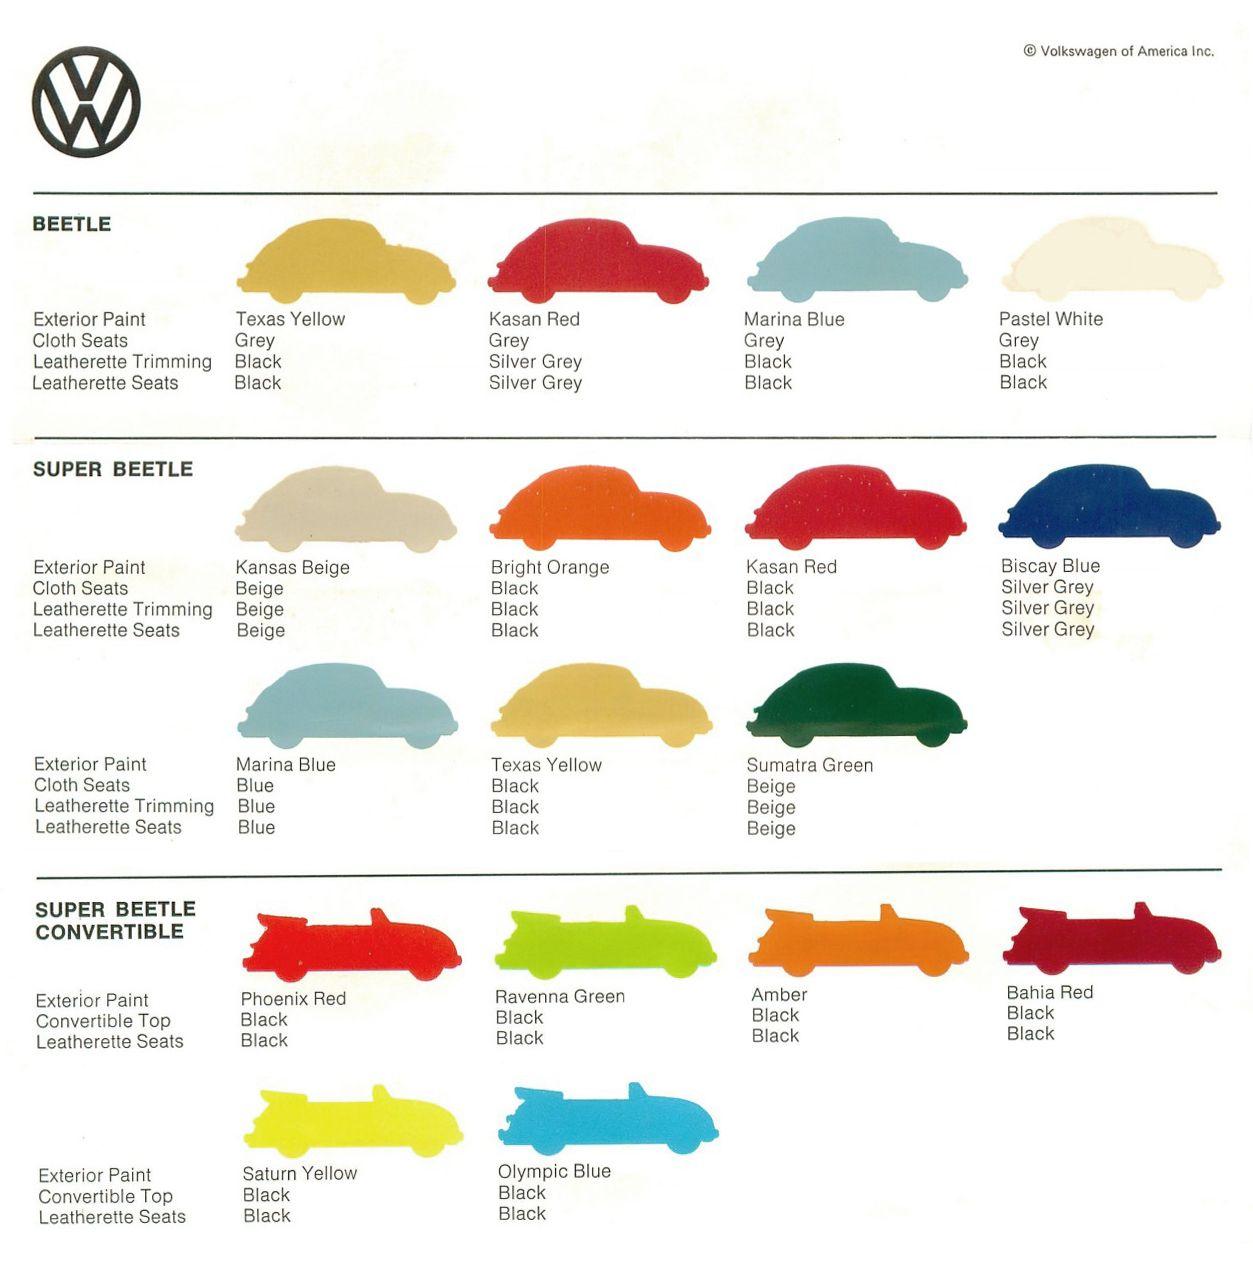 hight resolution of vw beetle color sheet 1973 volkswagen of america via thesamba